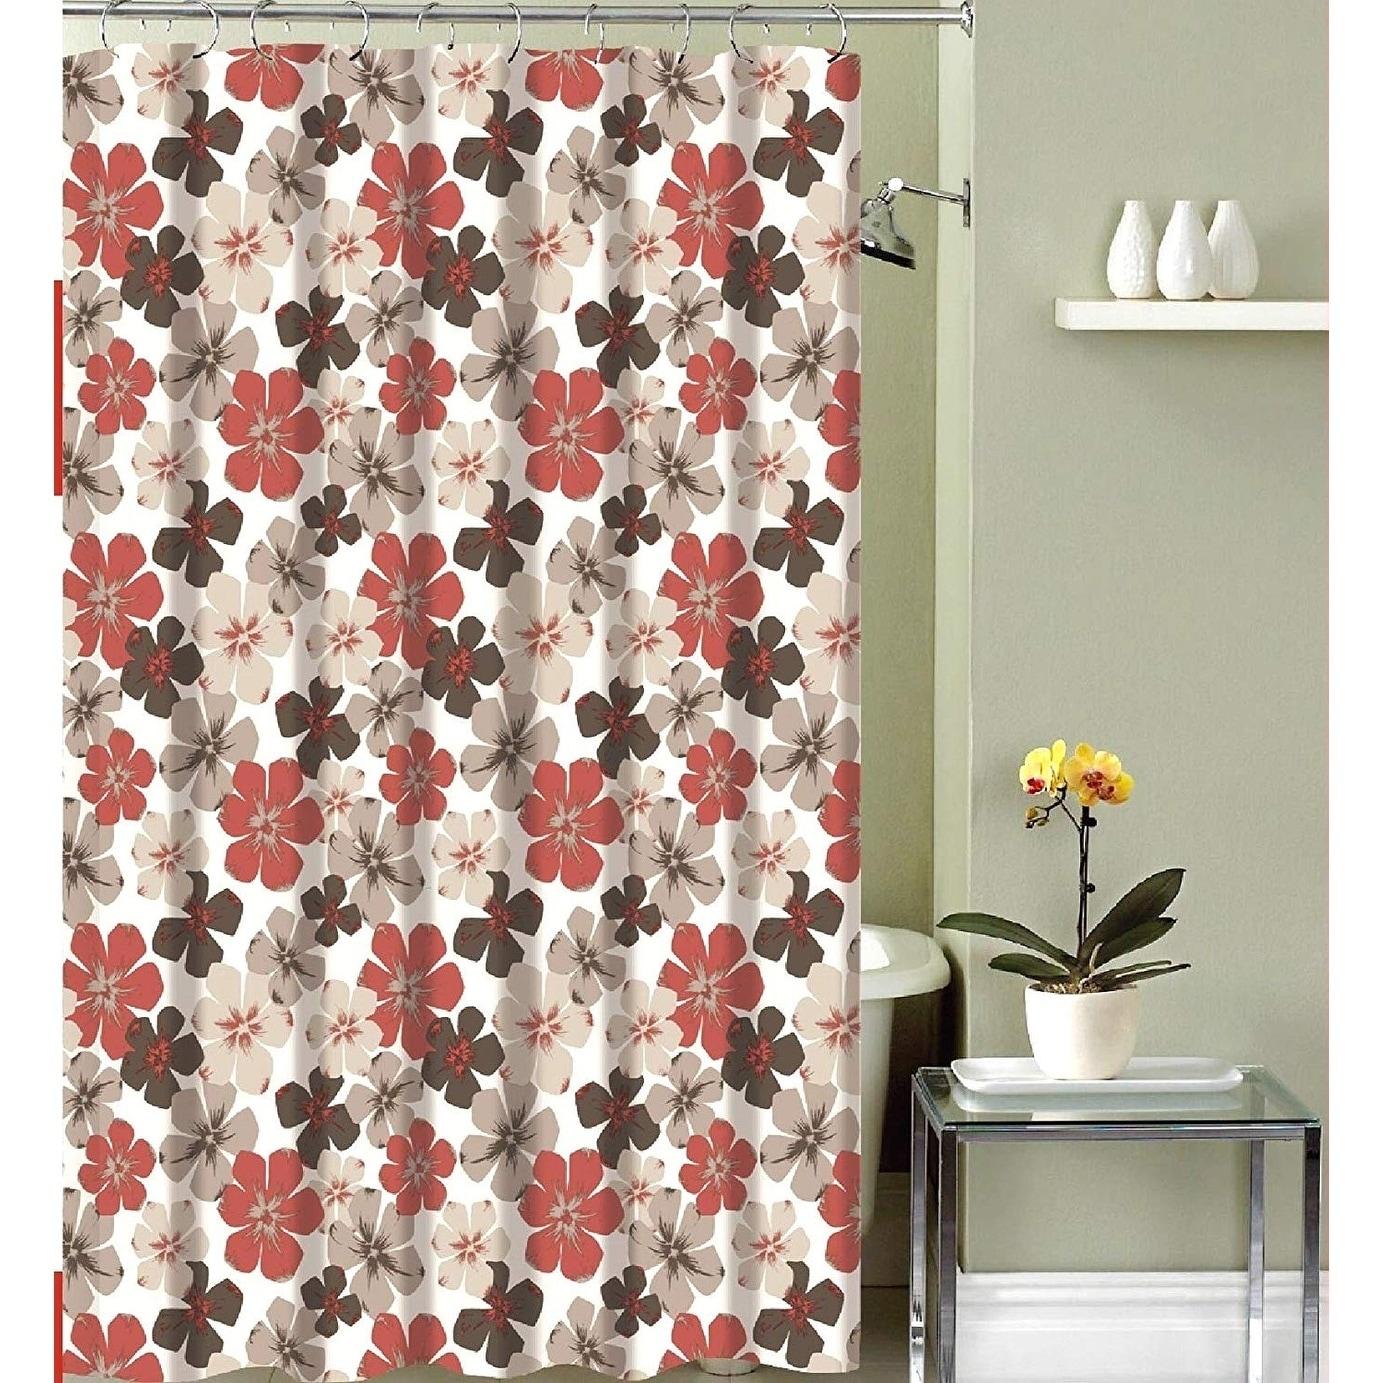 Fabric Shower Curtain Primitive Burgundy Beige Design 70 X 72